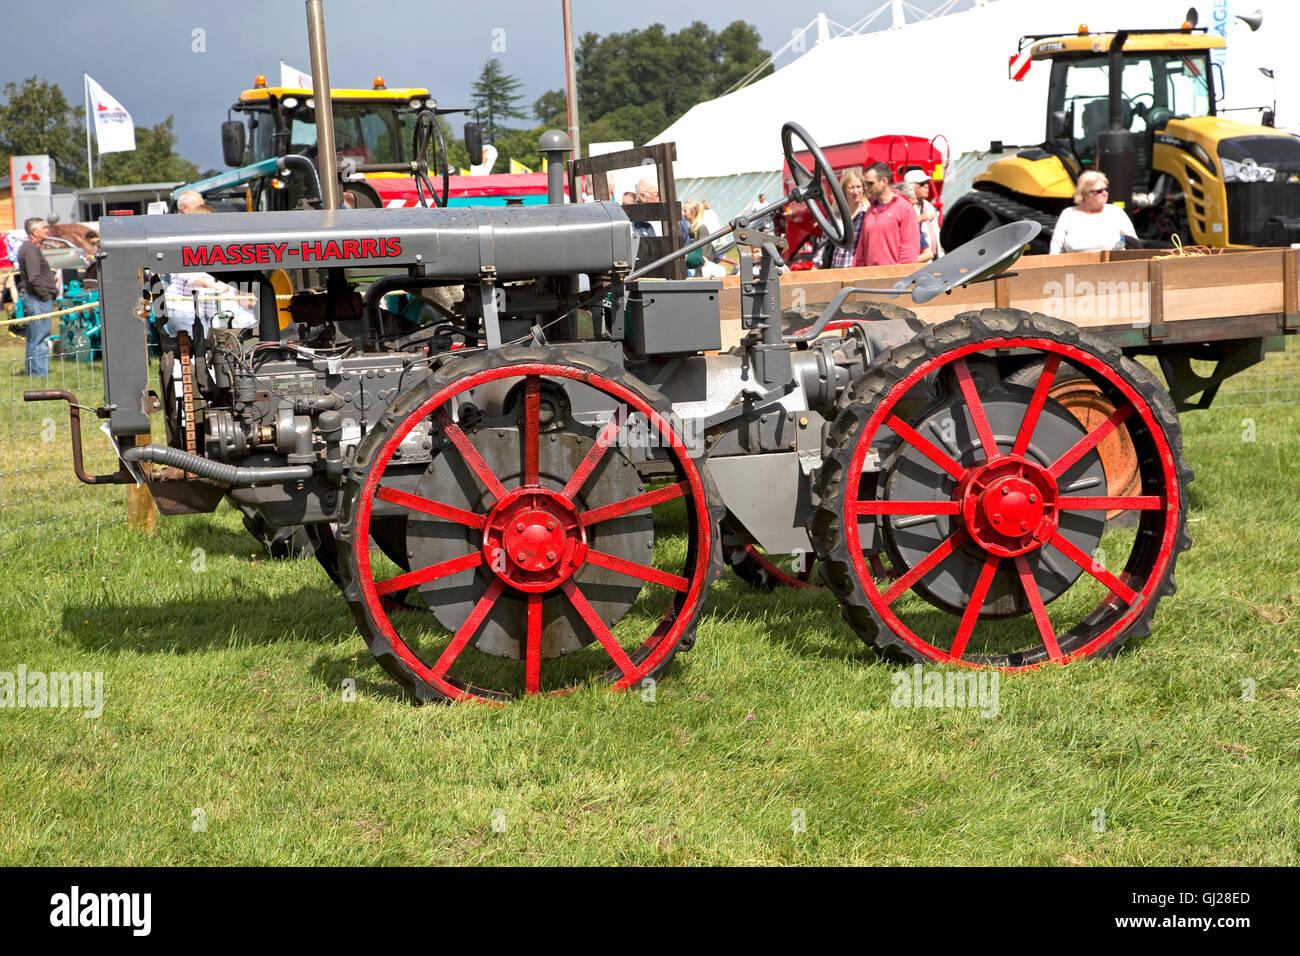 Antique Tractors 4 Wheel Drive : Massey harris gp early wheel drive vintage tractor